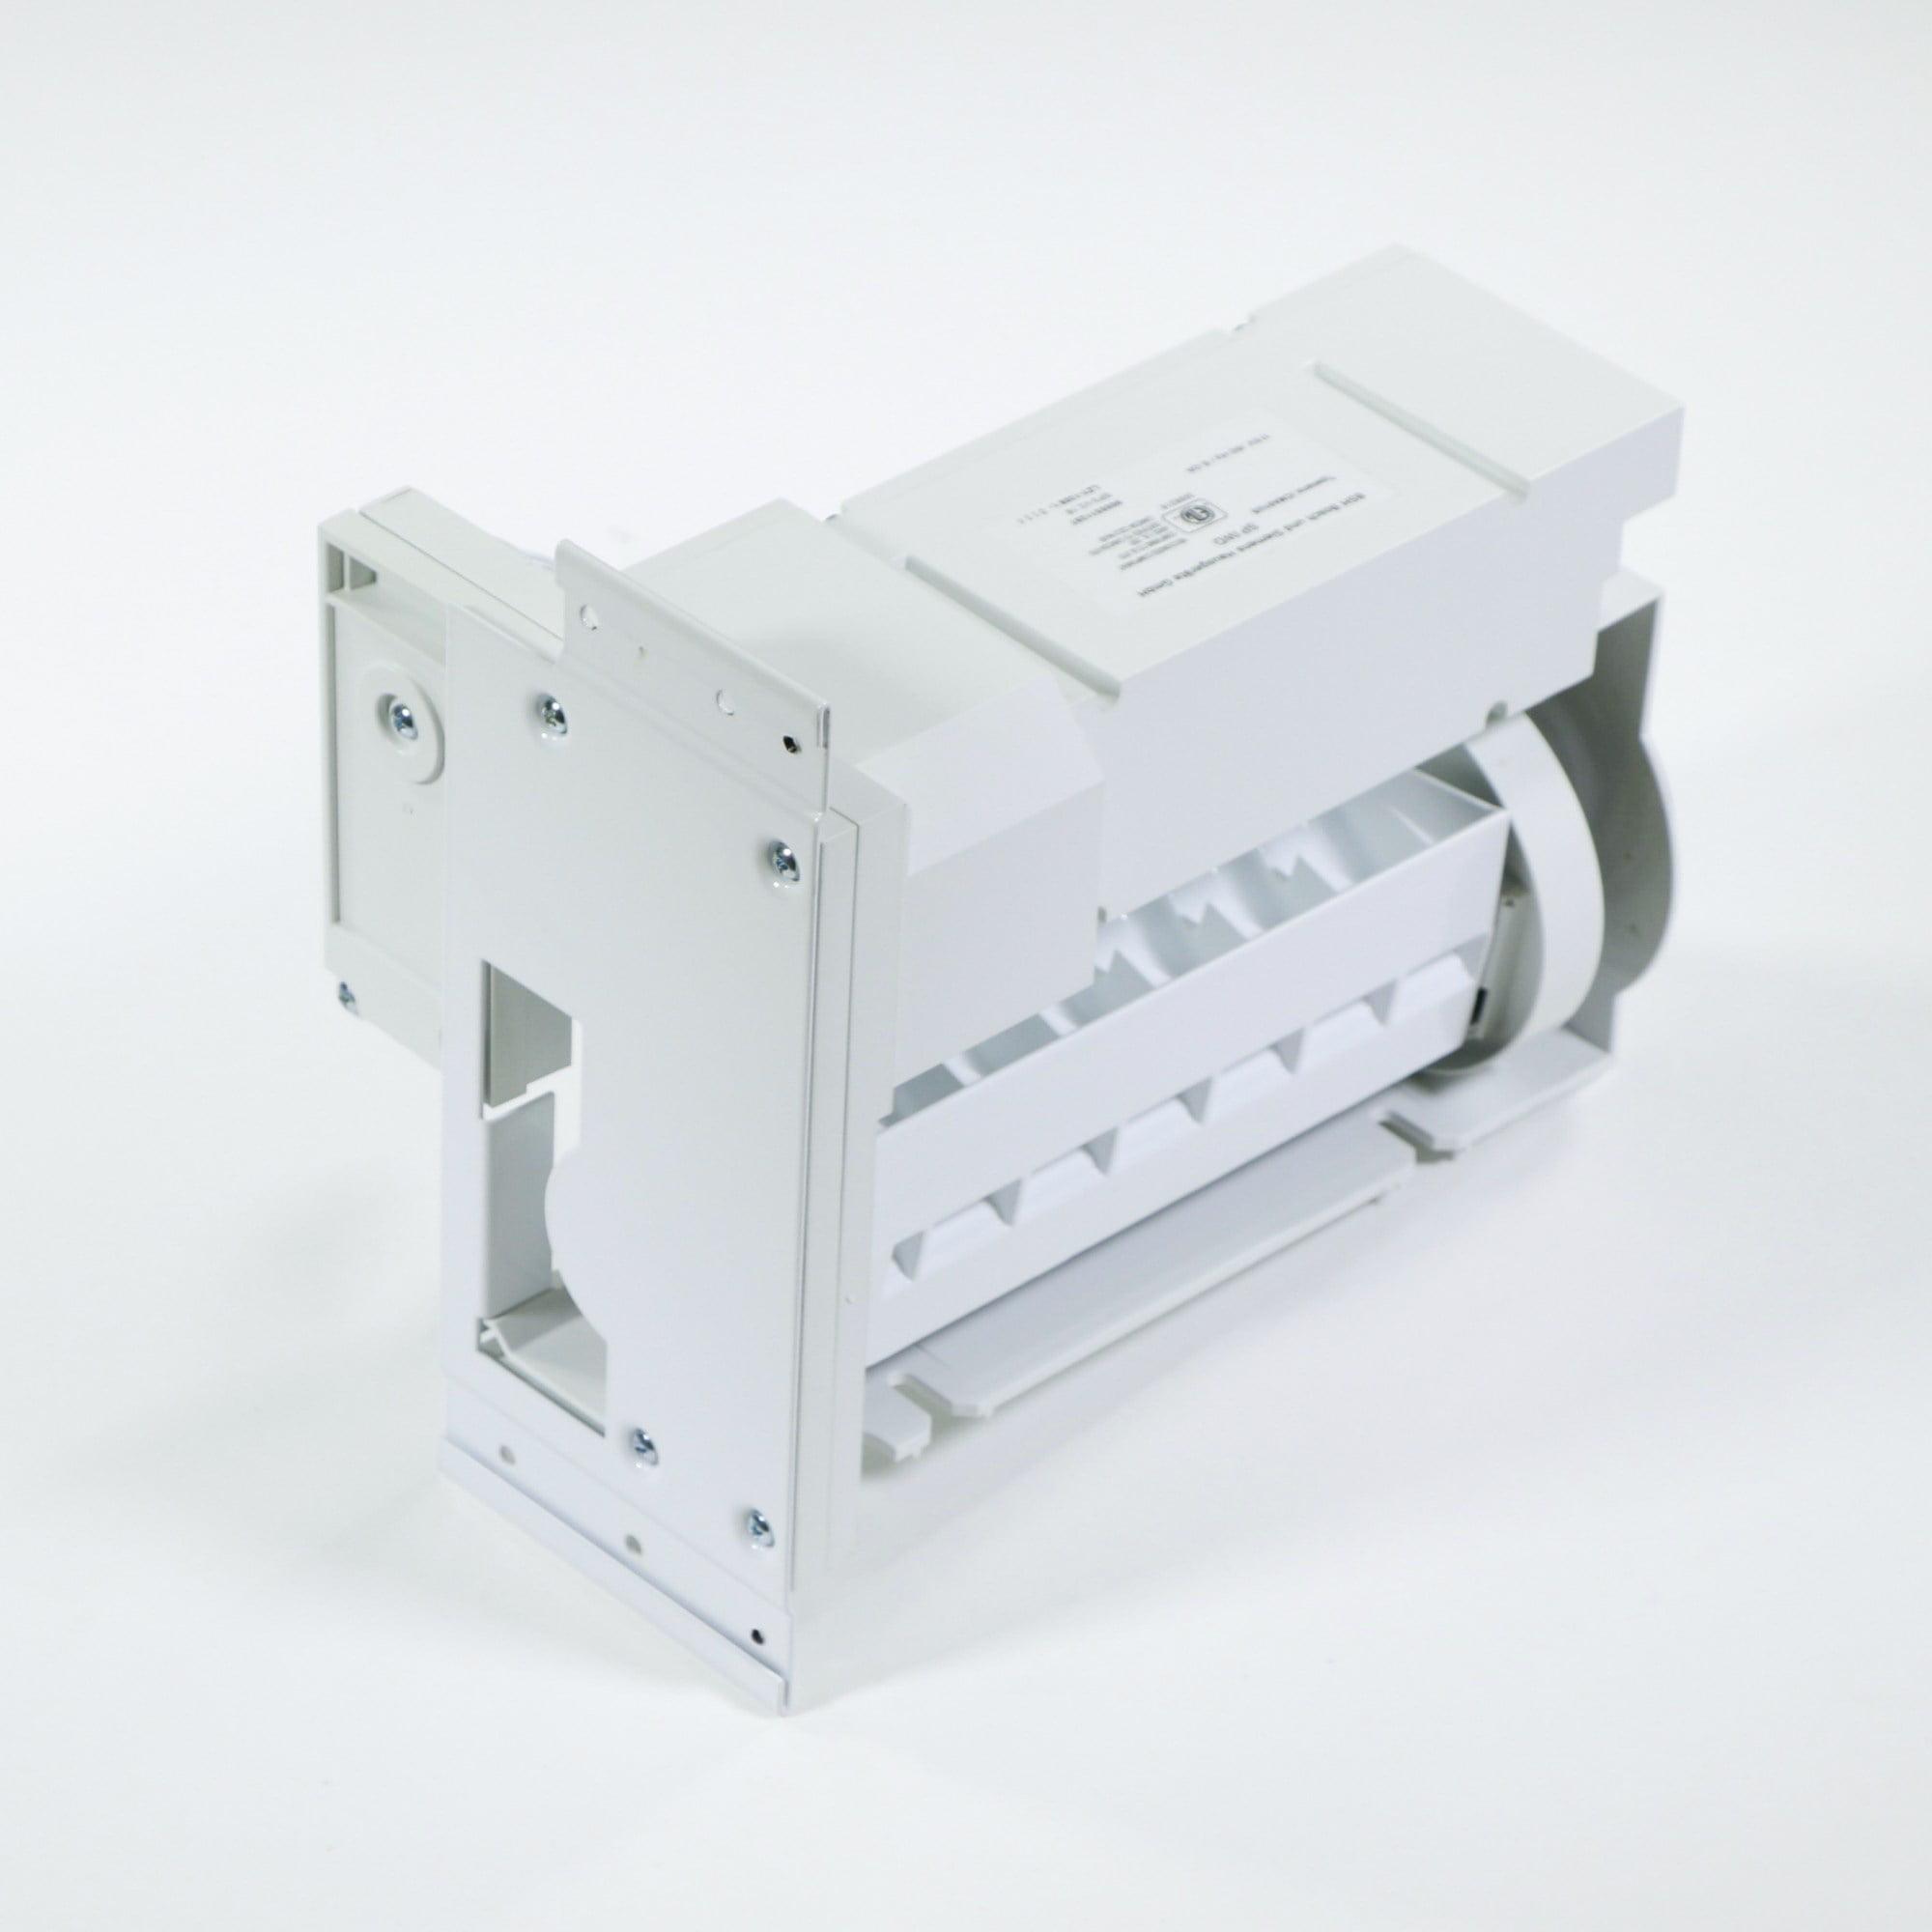 00707593 For Bosch Refrigerator Icemaker